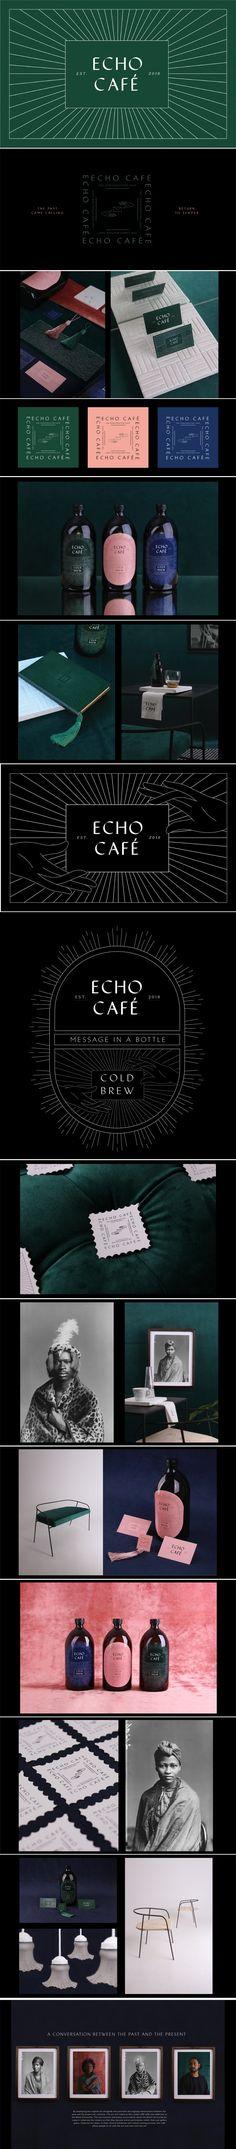 Echo Café branding and packaging by Eduan Viljoen